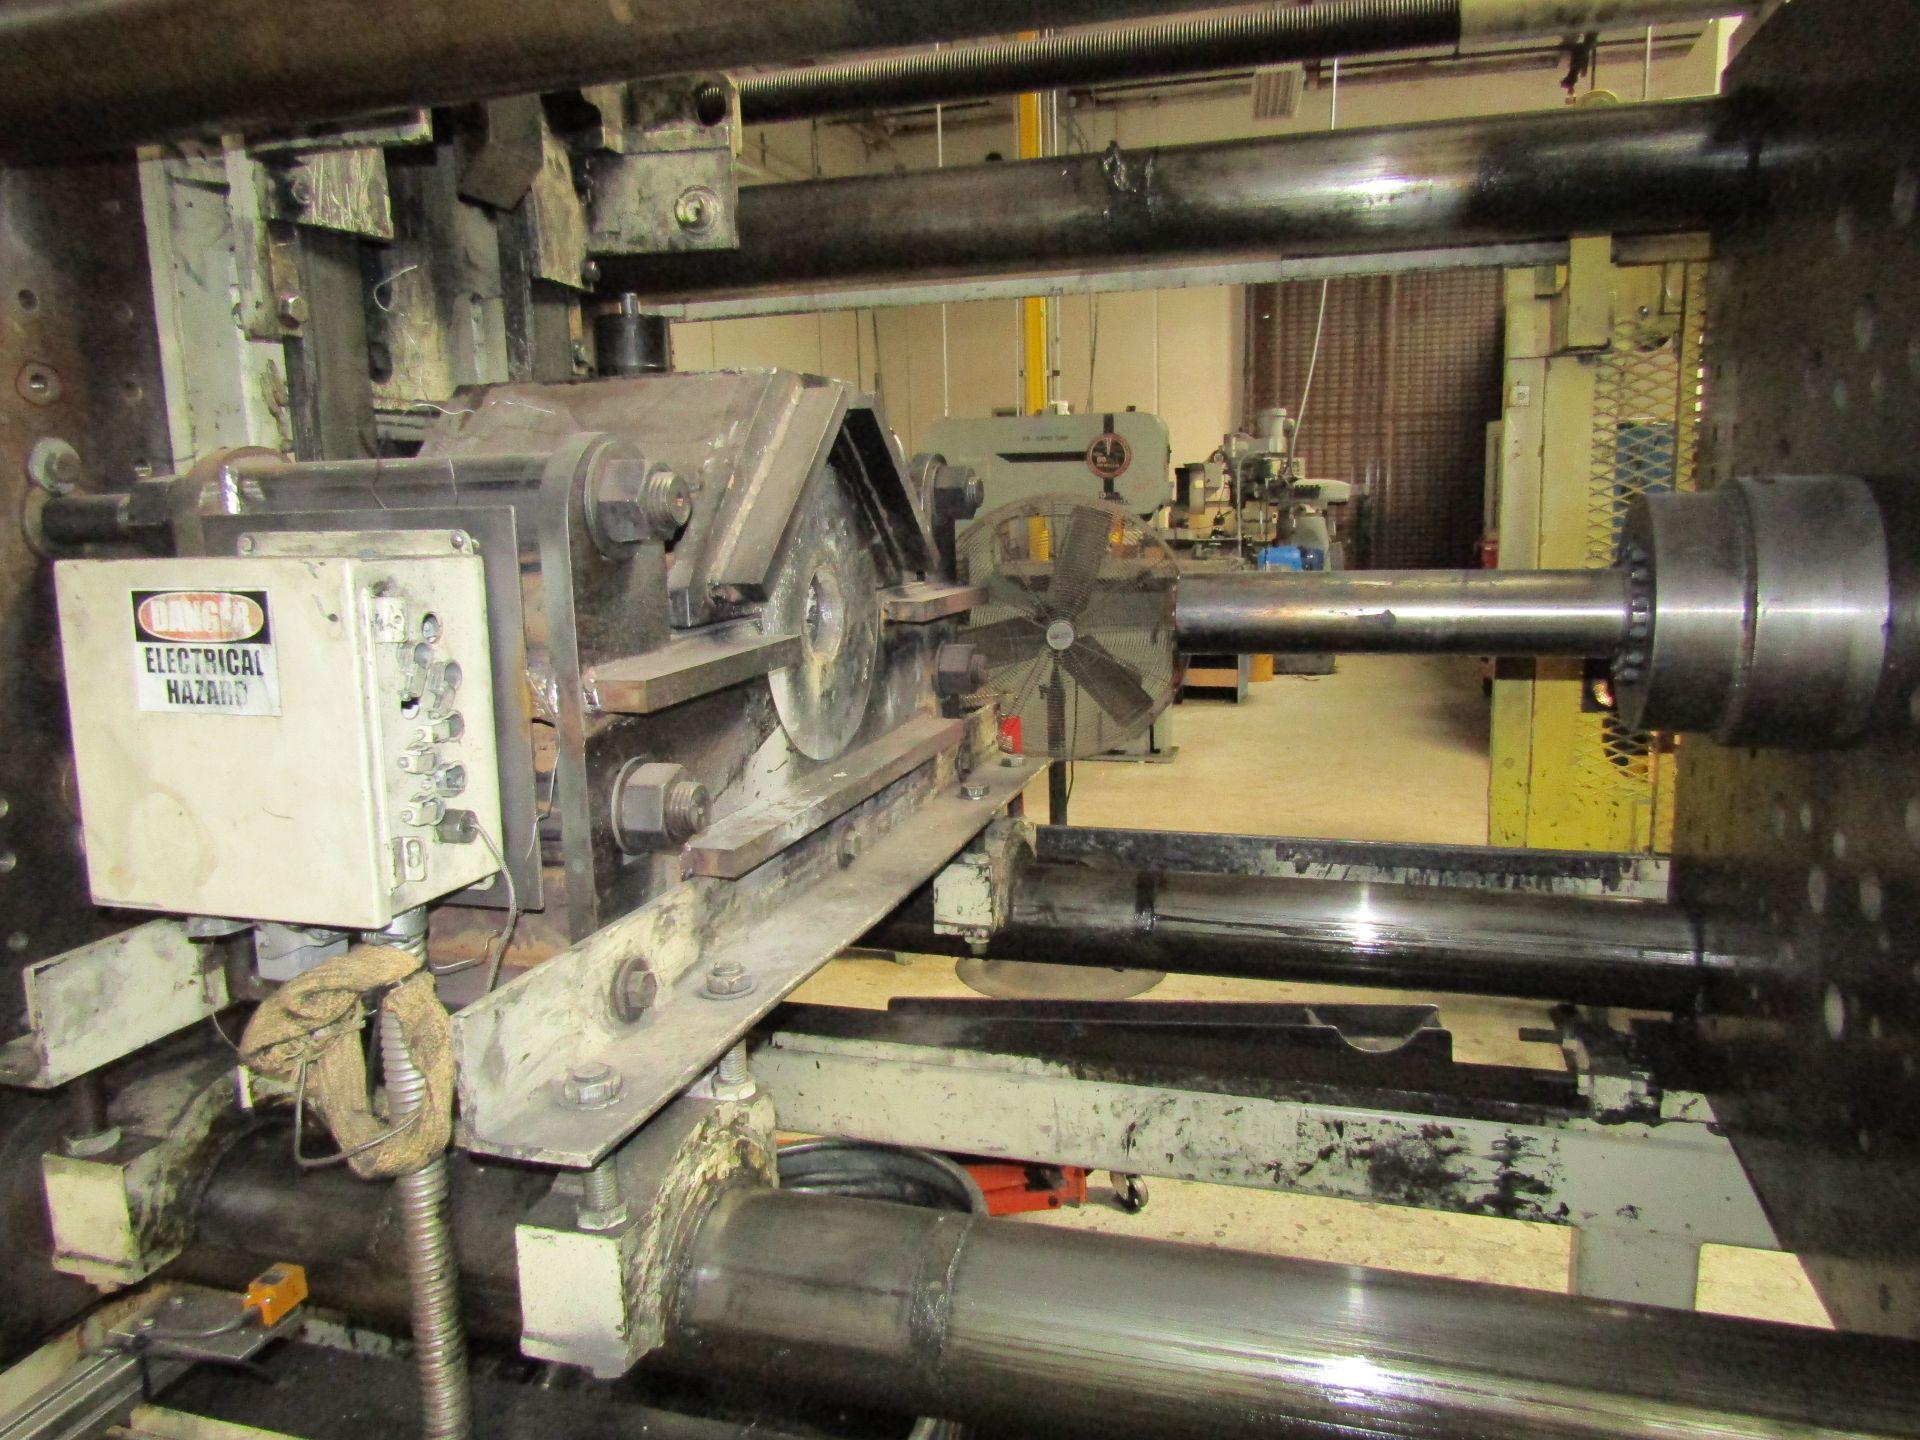 Lot 8 - 1992 MITSUBISHI 610 MG-110 4 Post Horizontal Extrusion Press With Electrical Controls, Operator